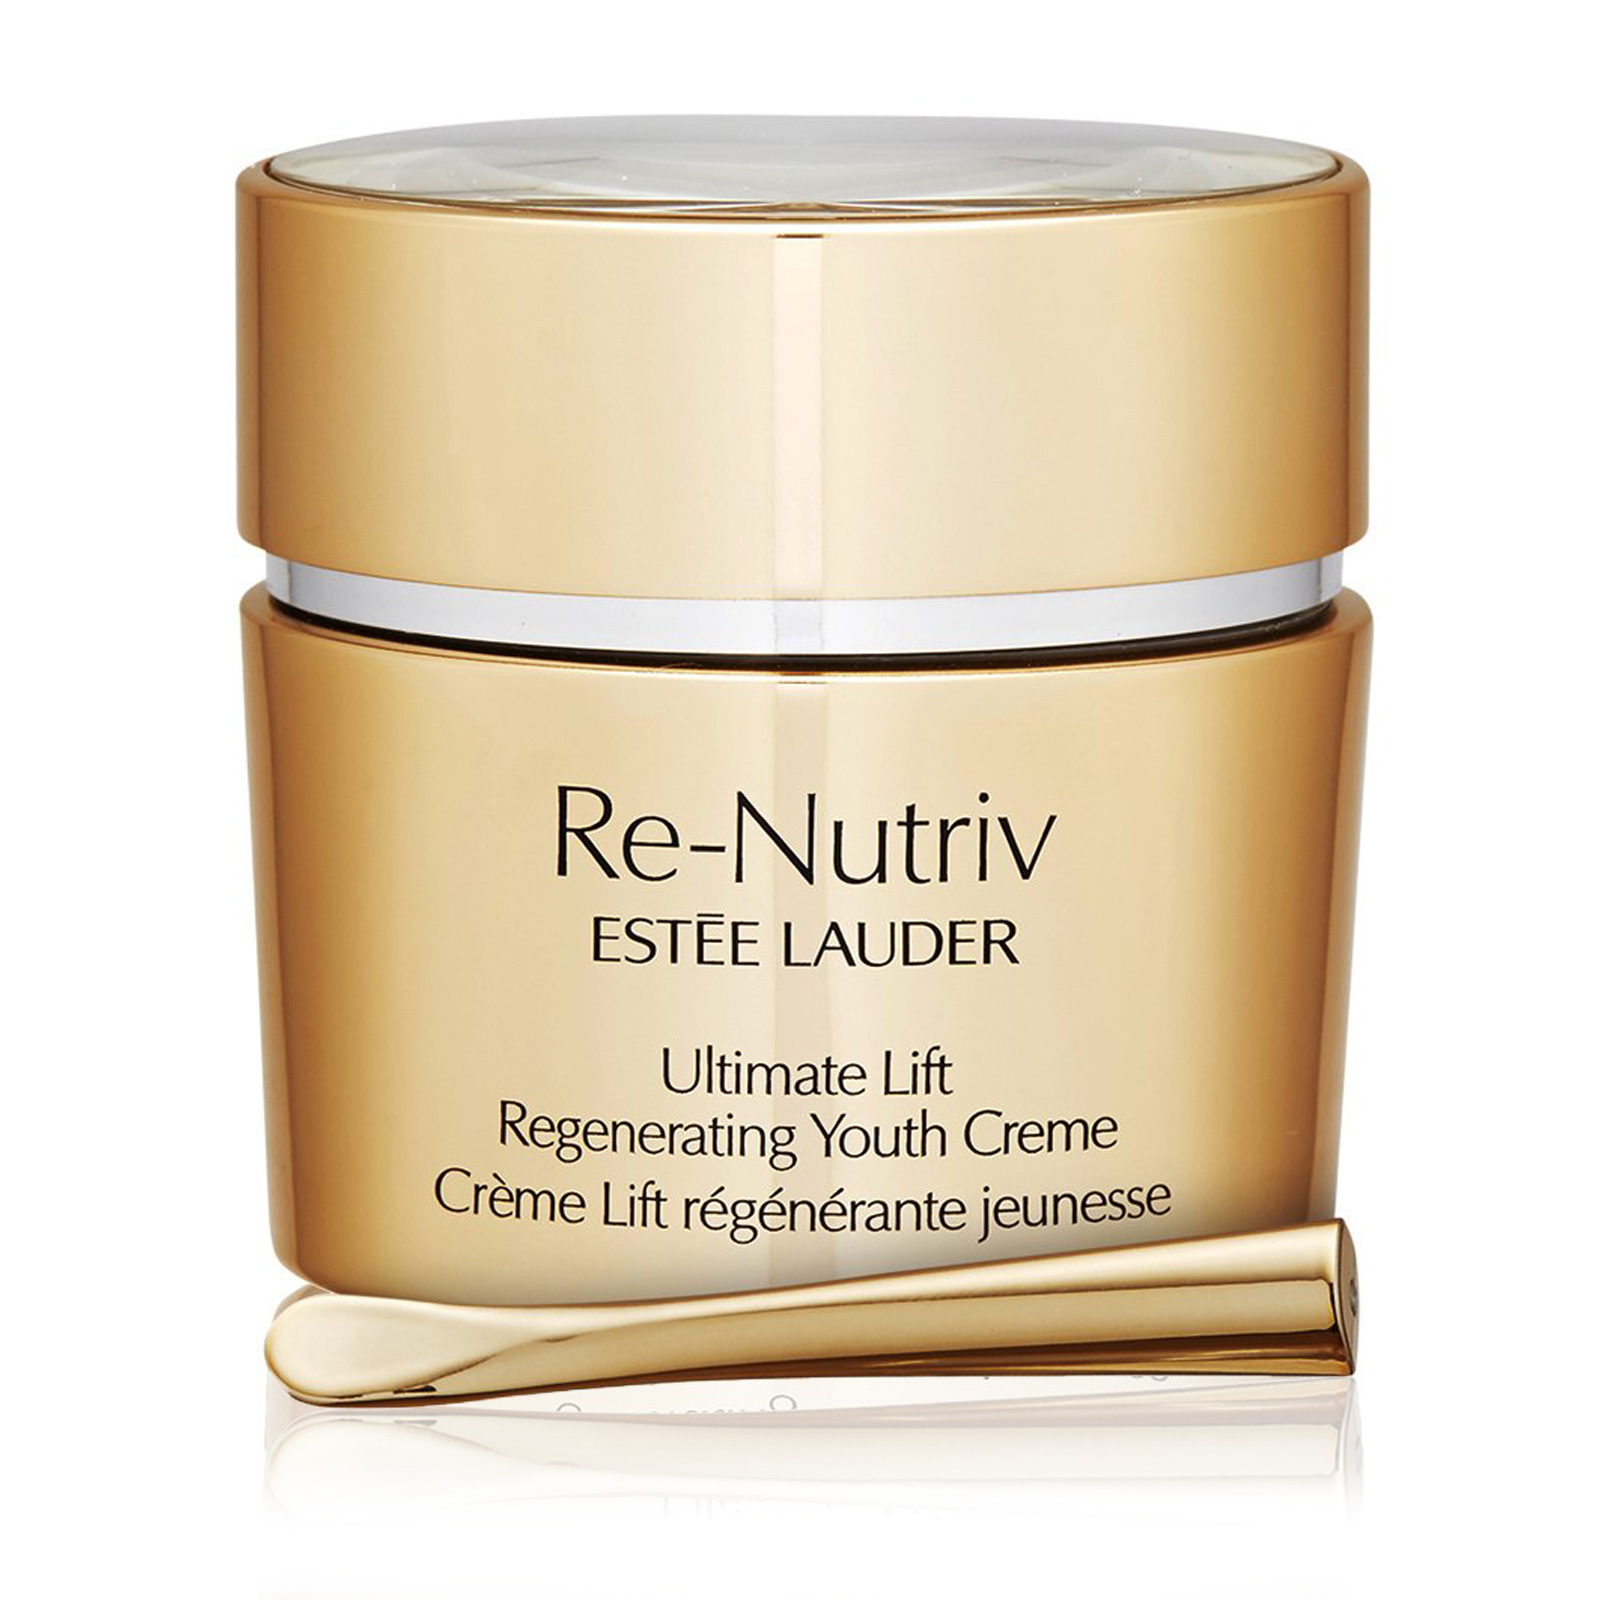 Re-Nutriv Ultimate Lift Regenerating Youth Crème